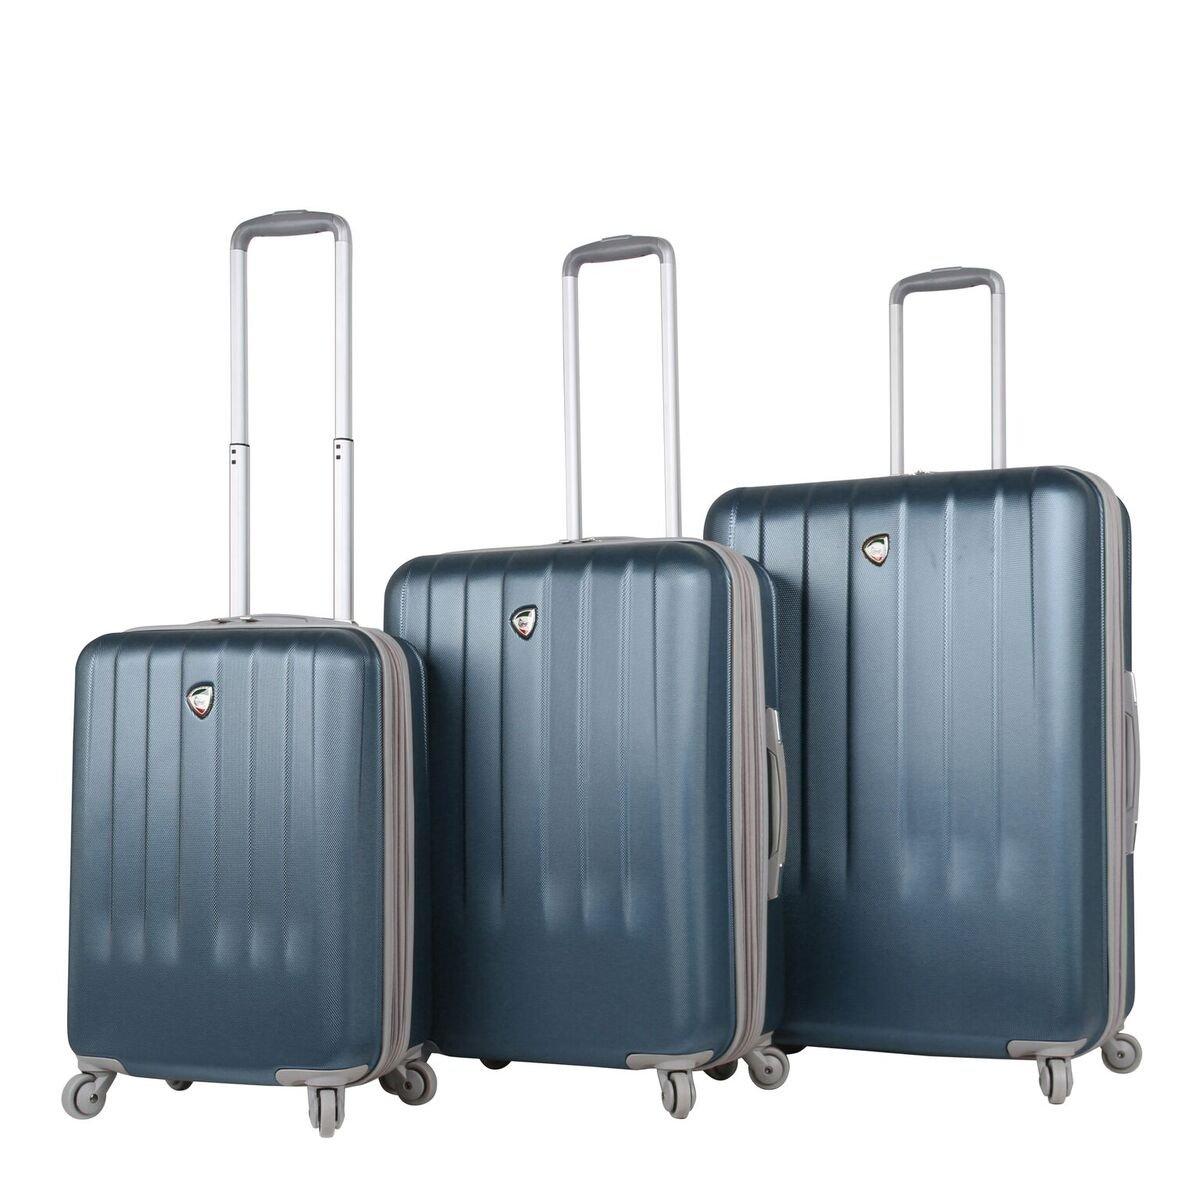 Slate Mia Toro Italy Mozzafiato Hardside Spinner Luggage 3pc Set